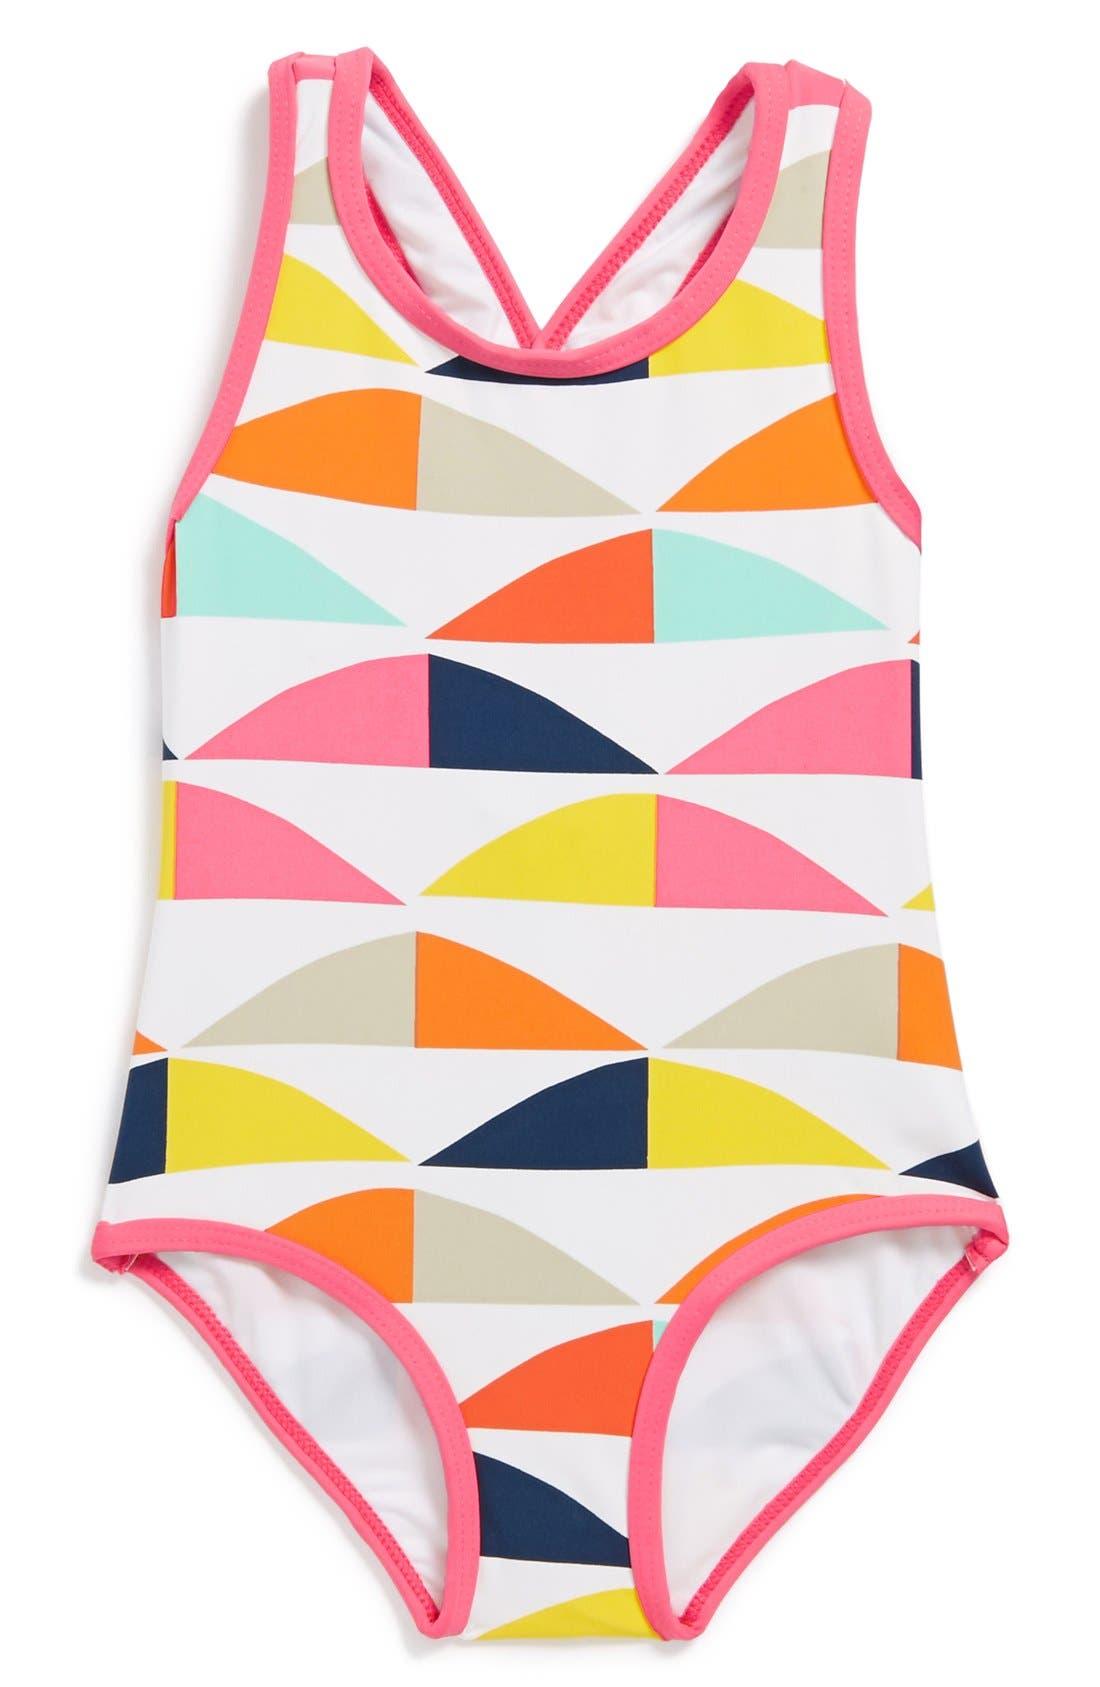 Alternate Image 1 Selected - Marimekko 'Polsku' One-Piece Swimsuit (Baby Girls)